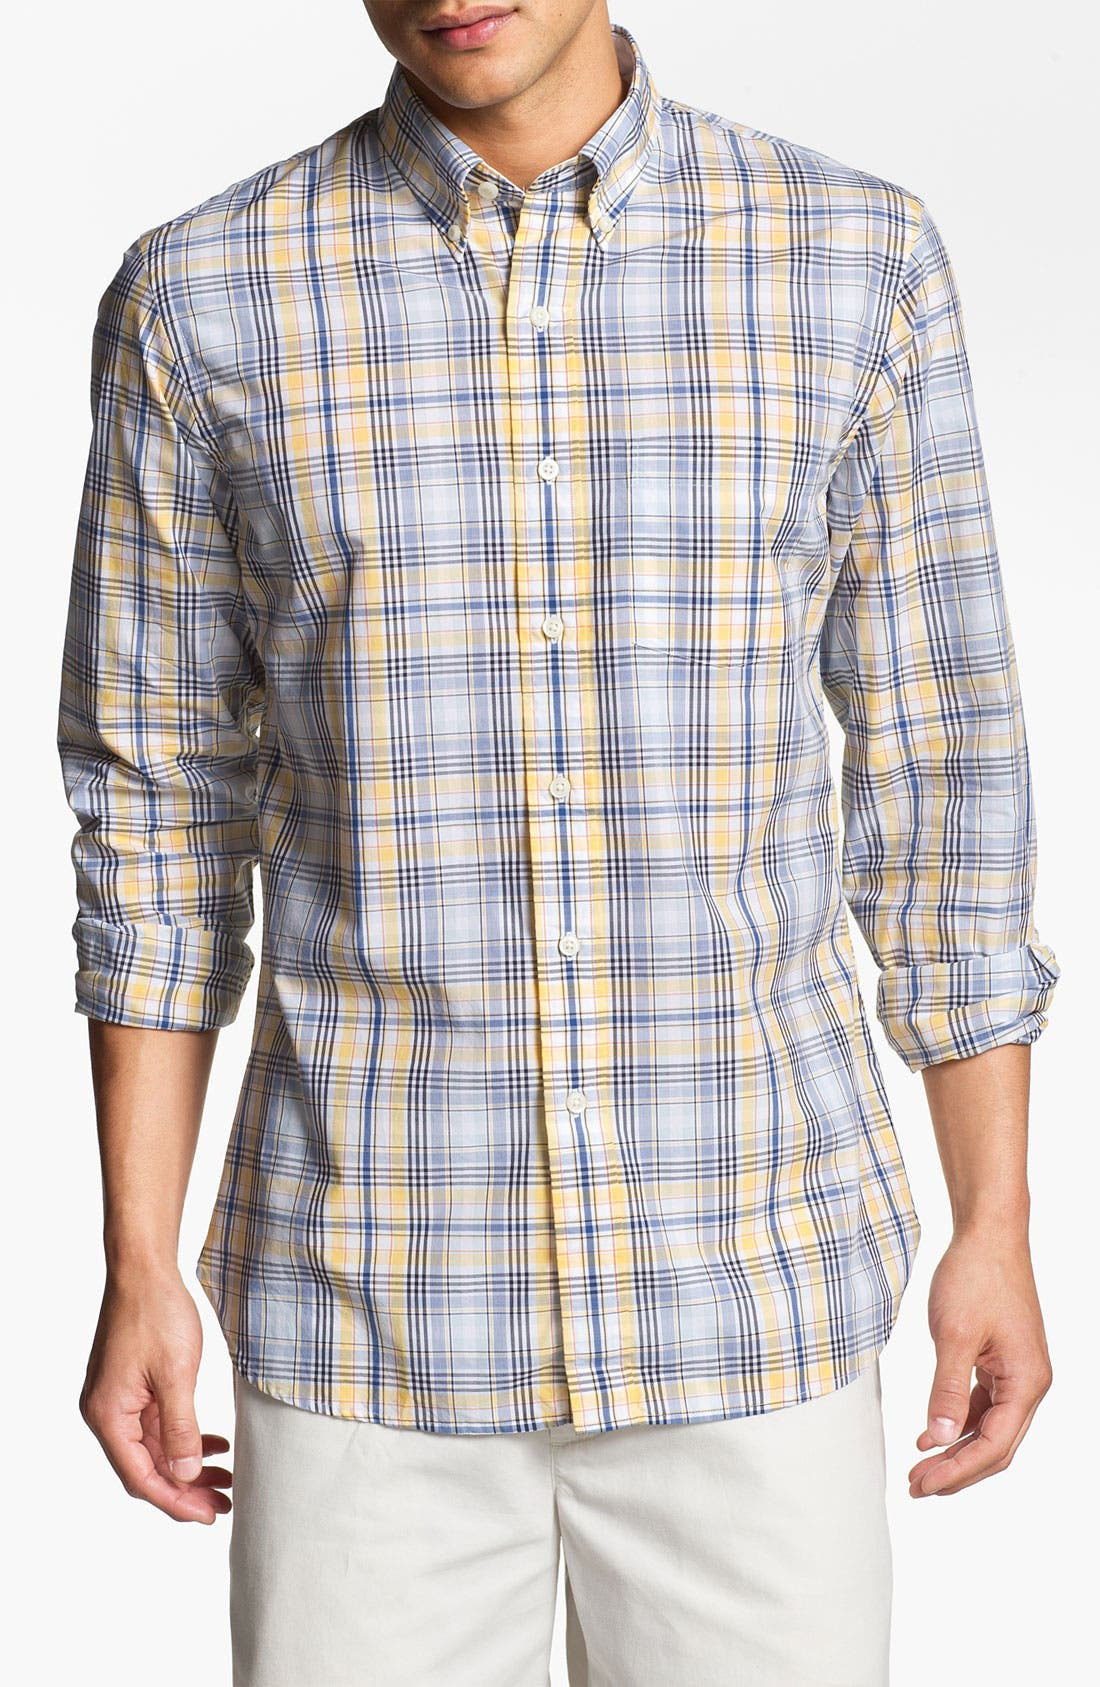 Alternate Image 1 Selected - Brooks Brothers Regular Fit Sport Shirt